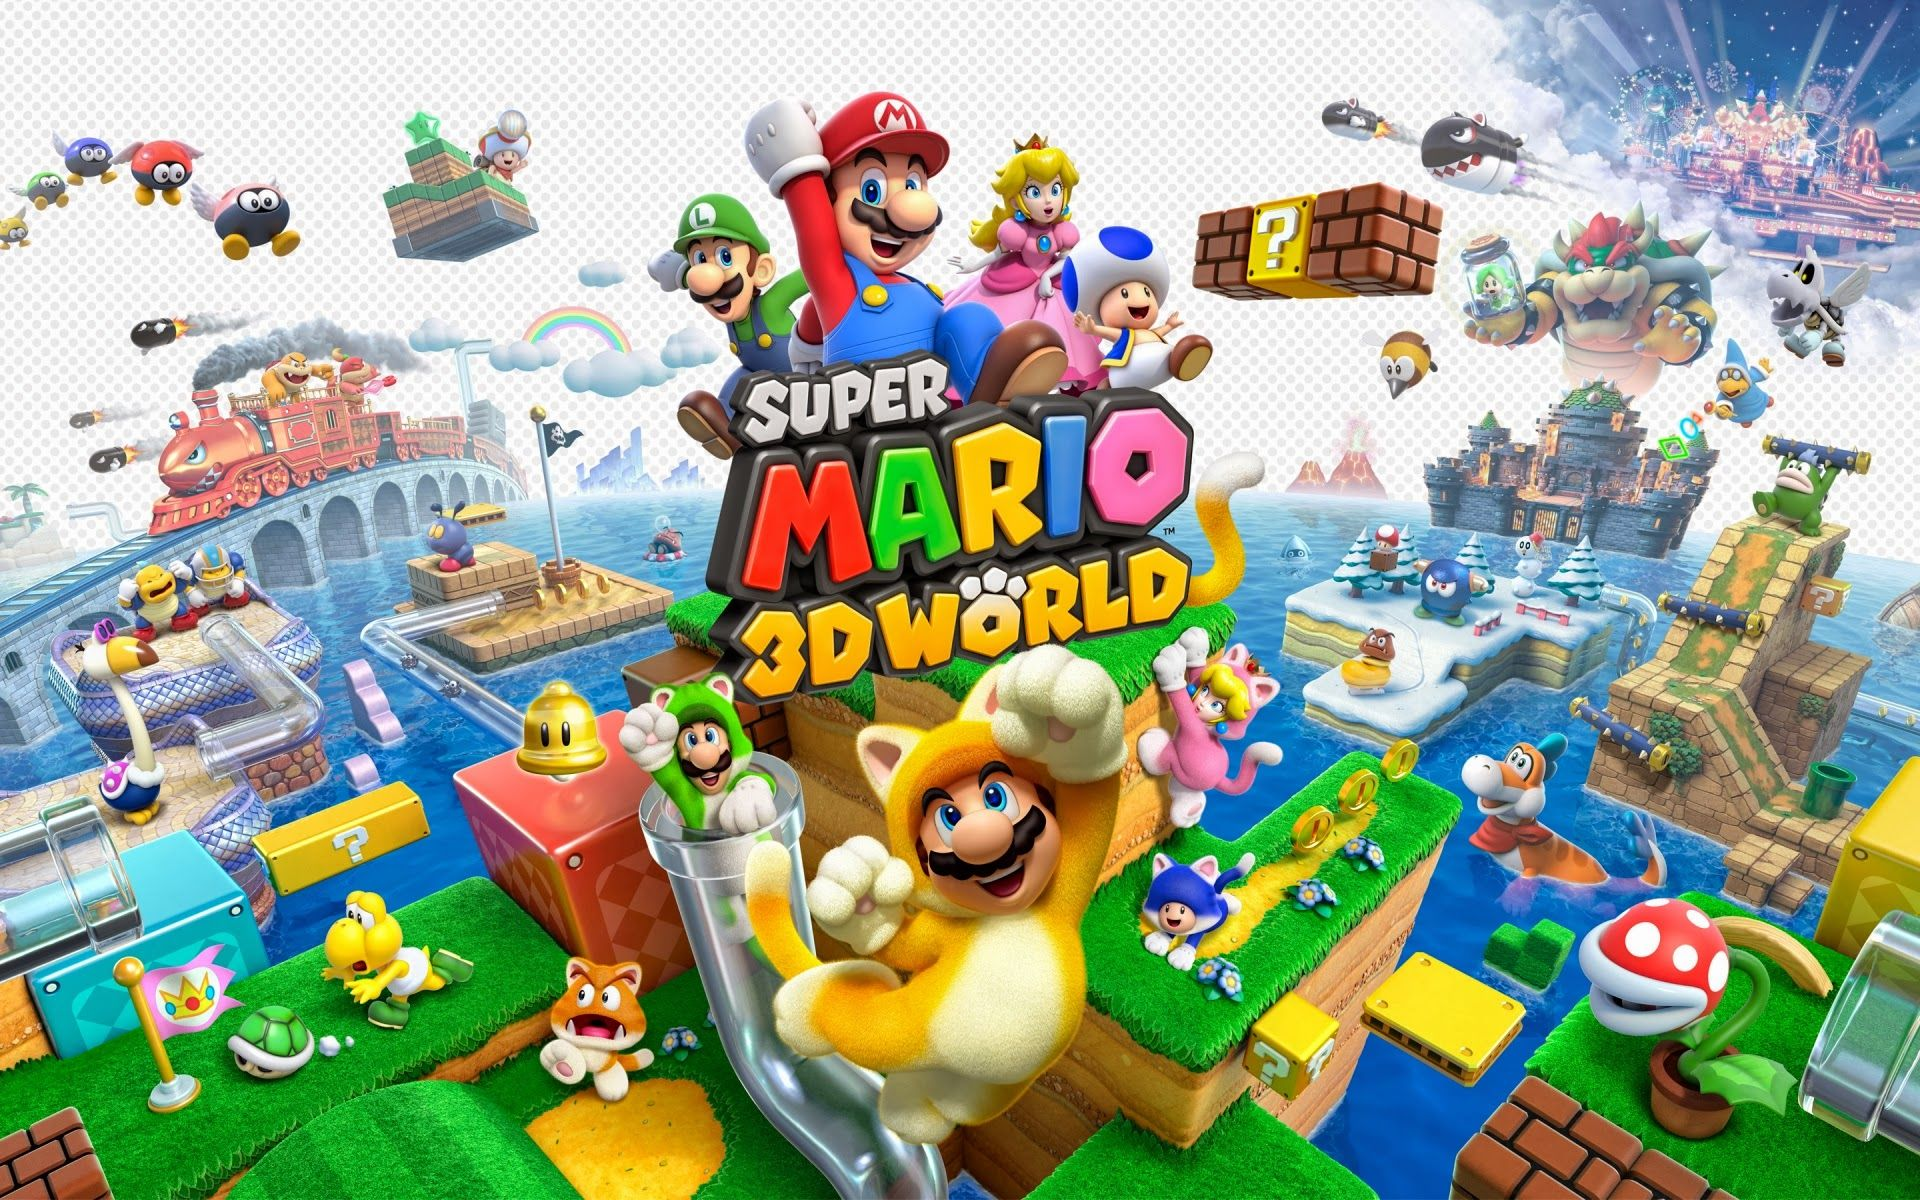 super mario 3d world coloring pages super mario 3d world coloring pages | Super Mario 3D World  super mario 3d world coloring pages